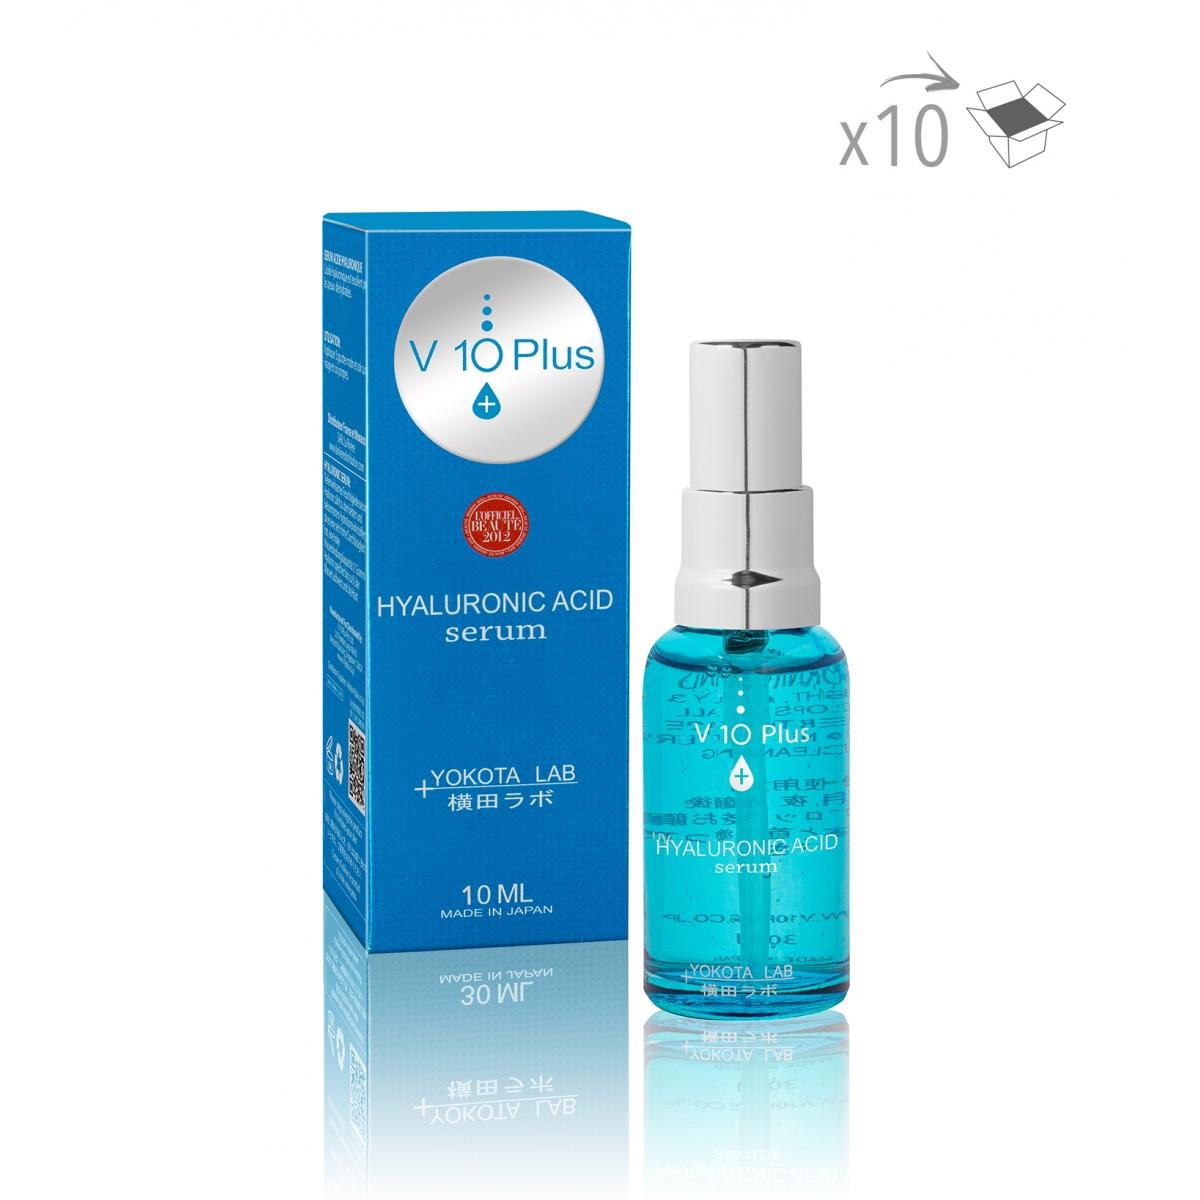 PRODUITS A LA REVENTE - ACIDE HYALURONIQUE SERUM V10+ (10 ml) (x10)